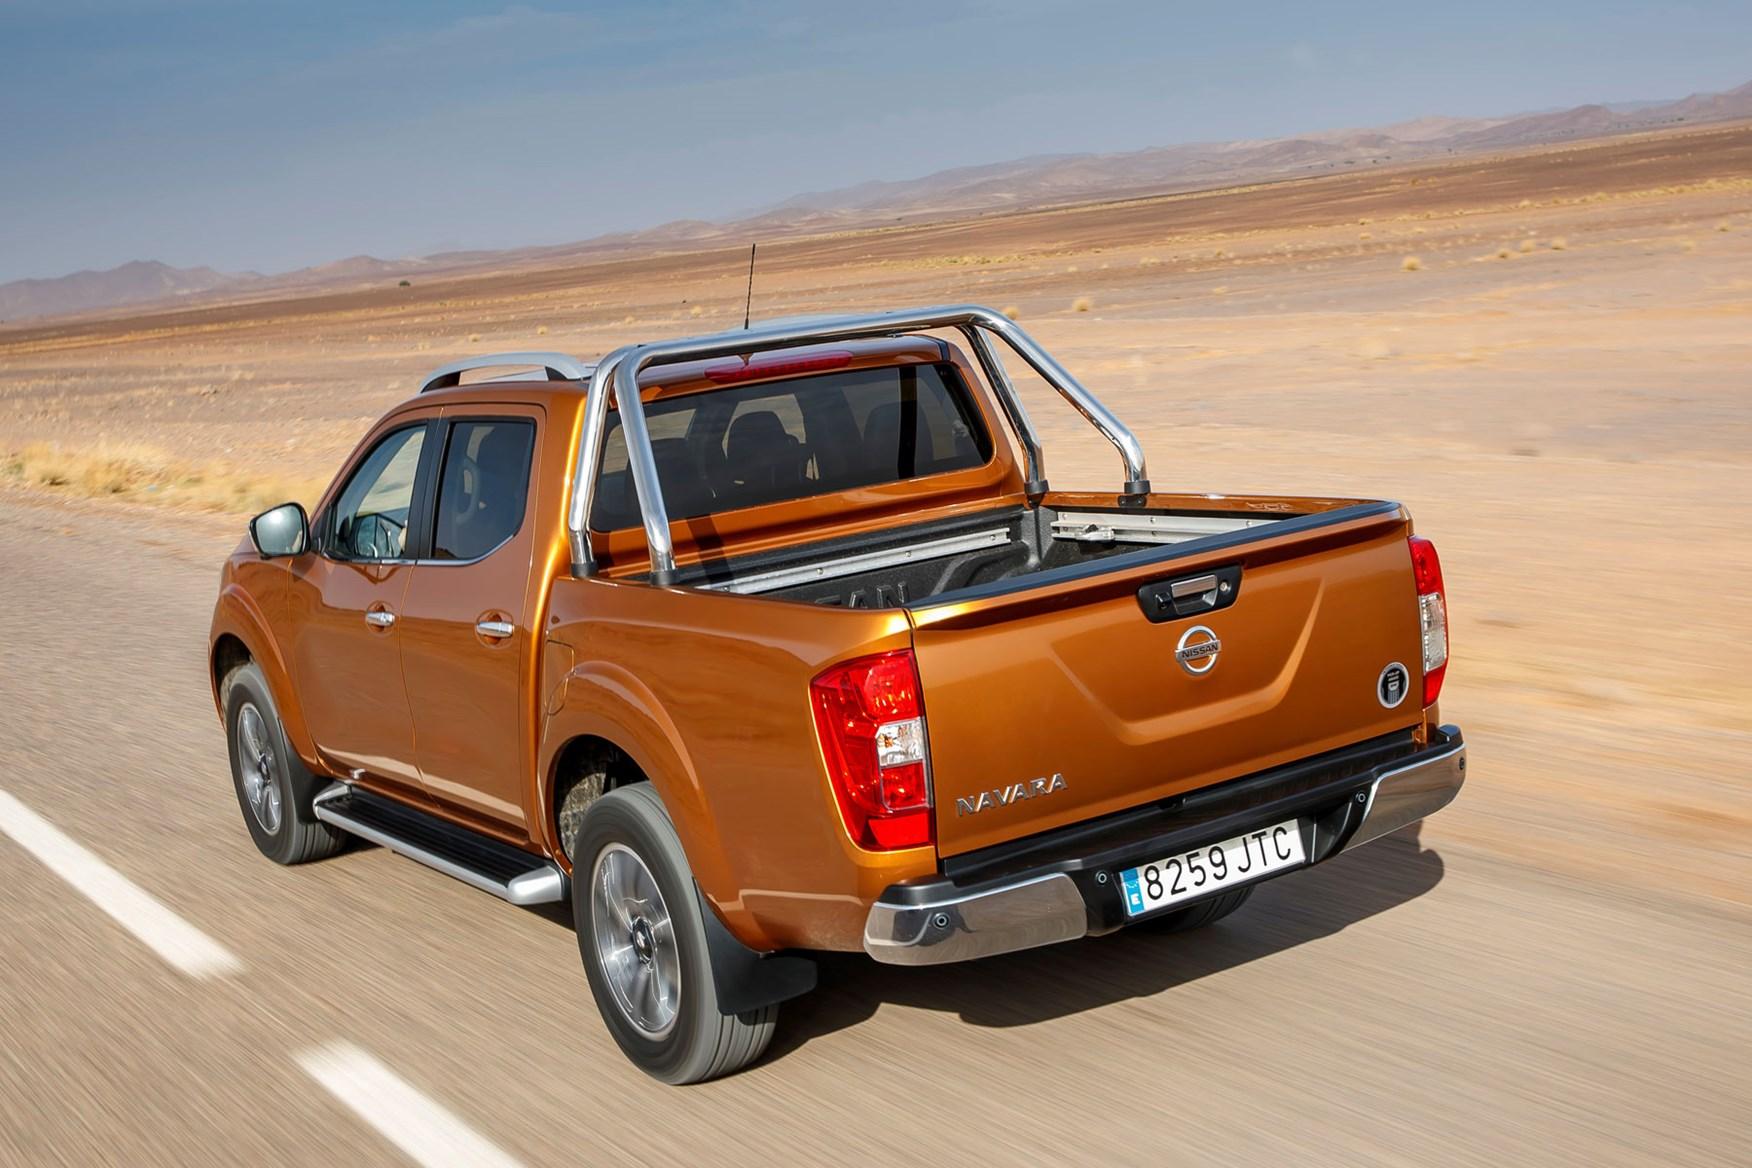 Nissan Navara Tekna review - rear view, driving on road, orange